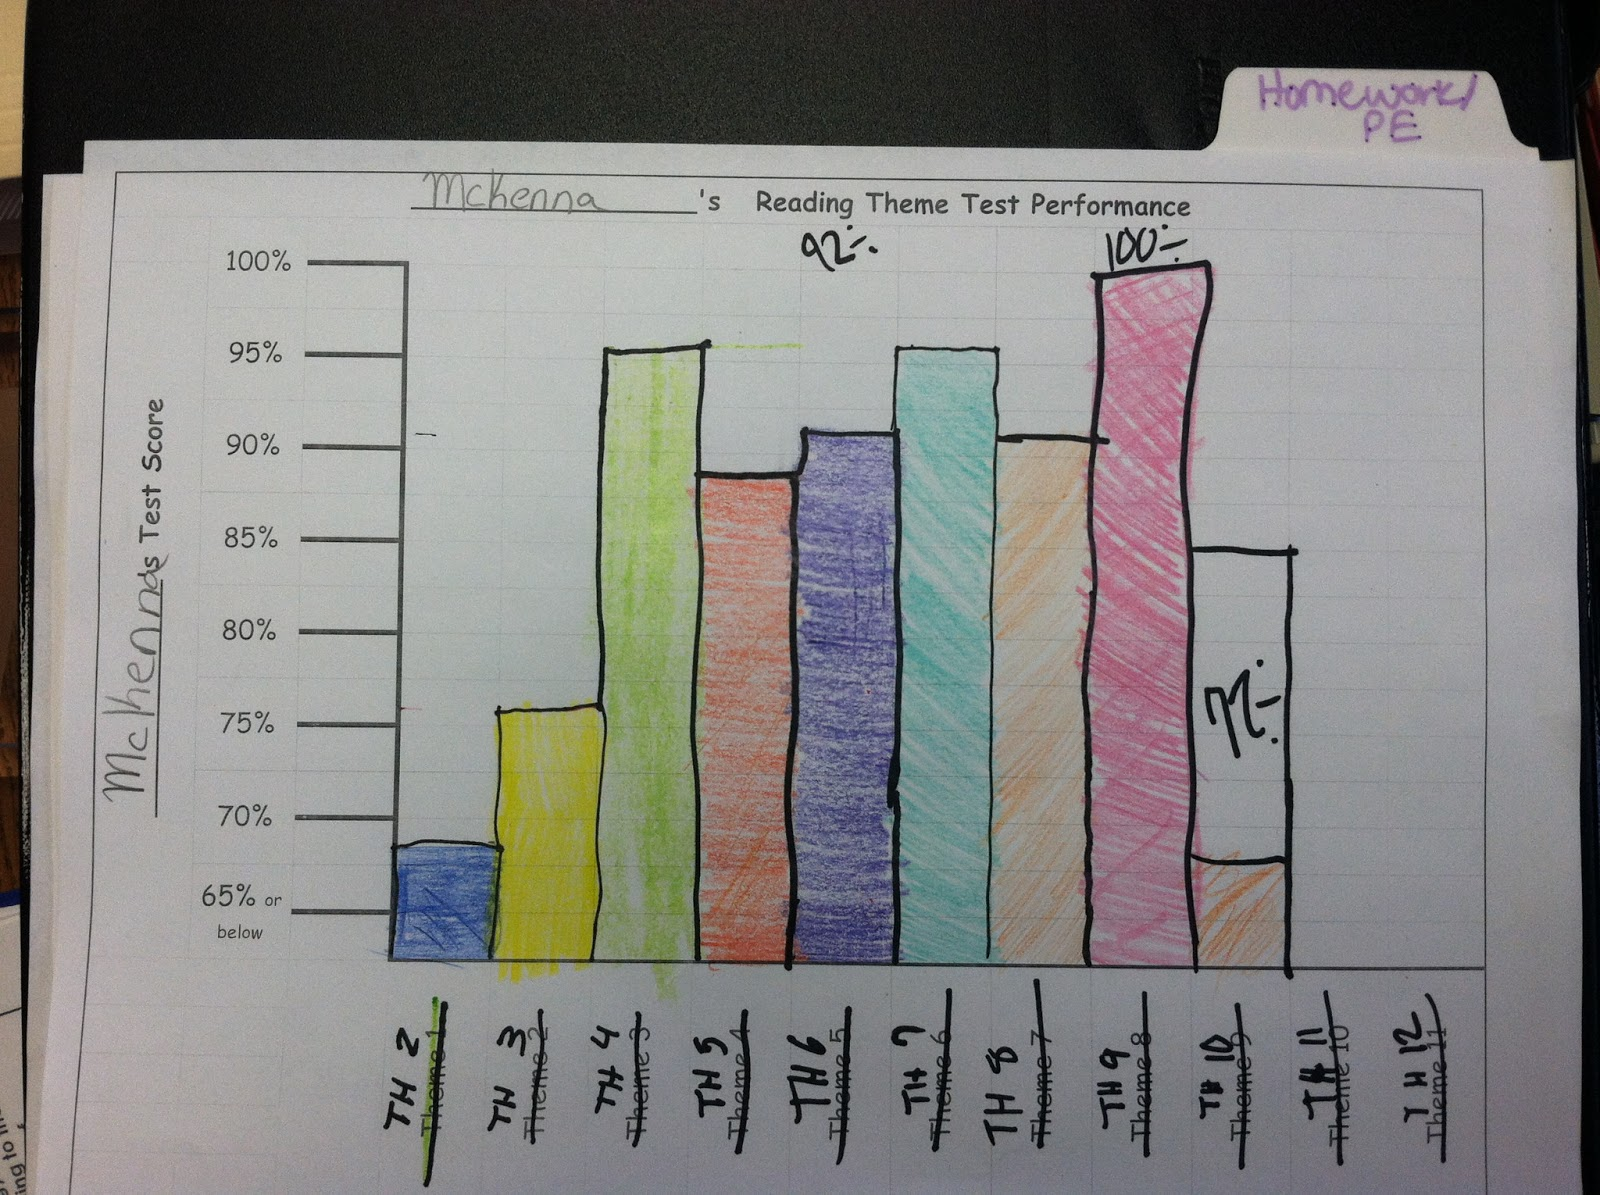 Quality Continuous Improvement at Dunlap Grade School